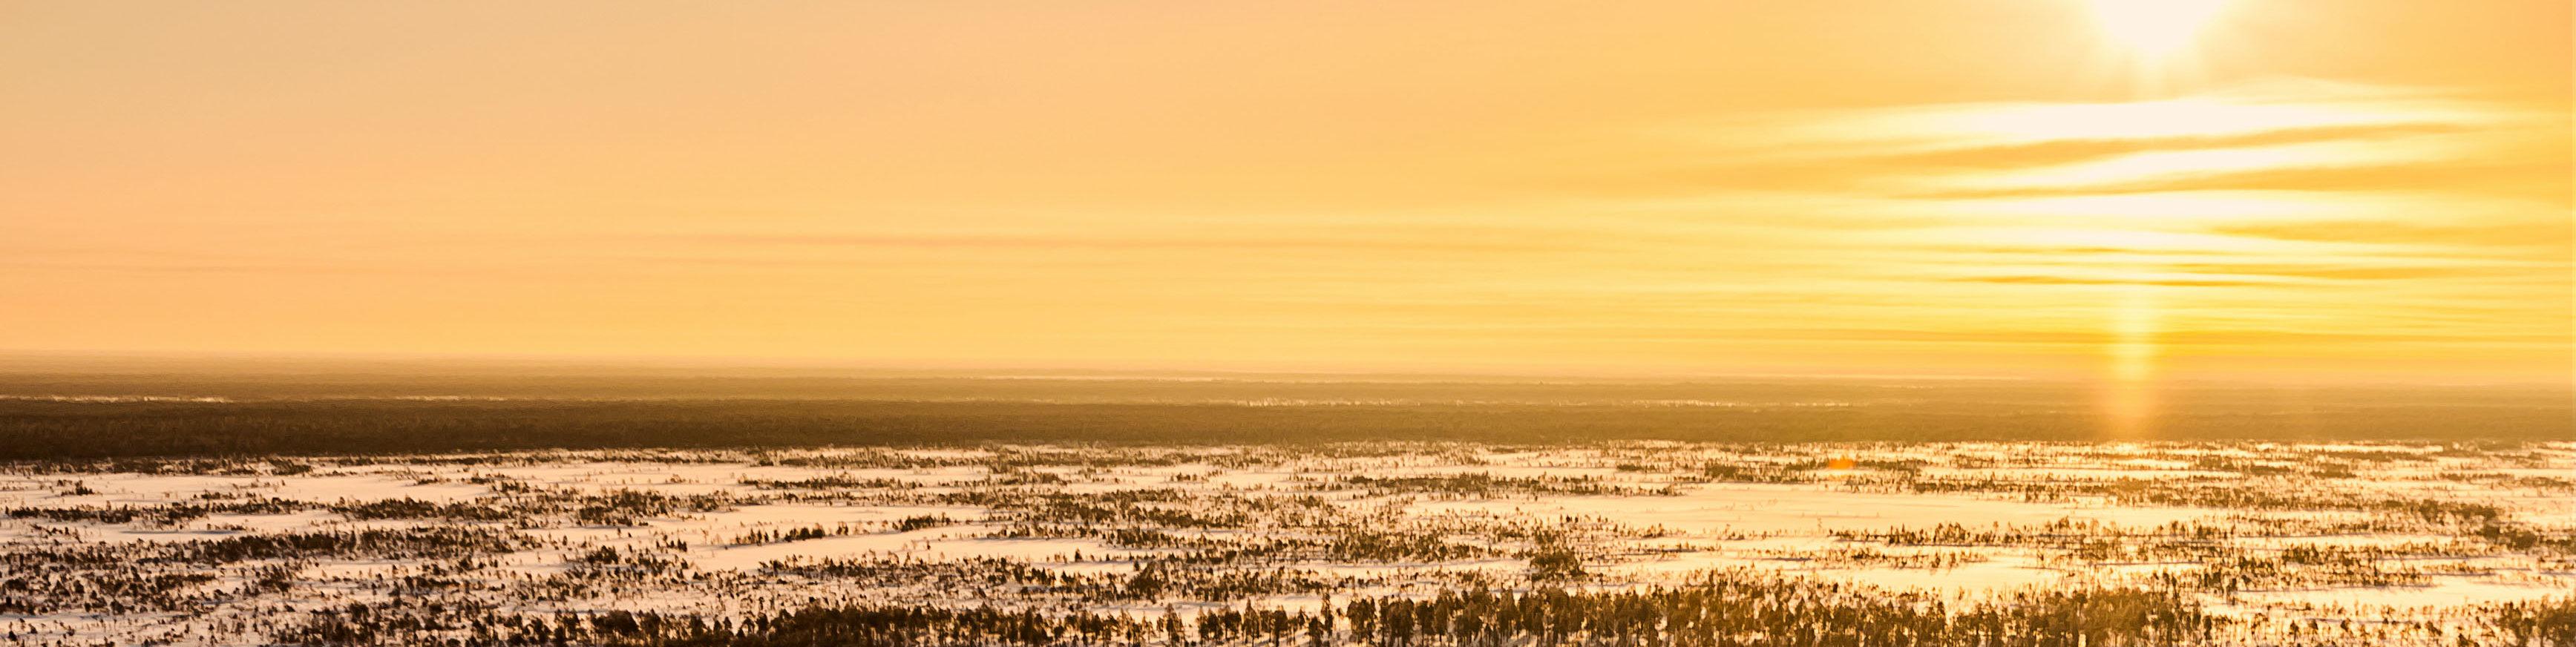 landscape view of frozen desert